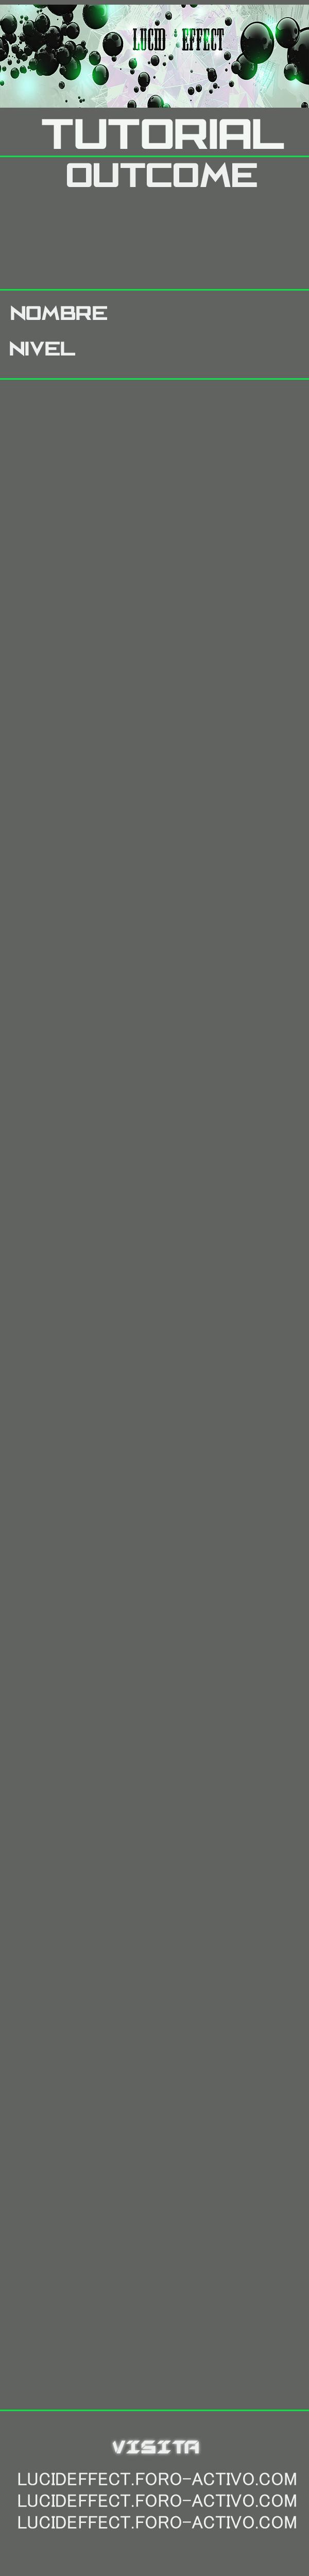 Plantilla tutoriales Plantillatuto_by_grankdesigns-d95ydrt